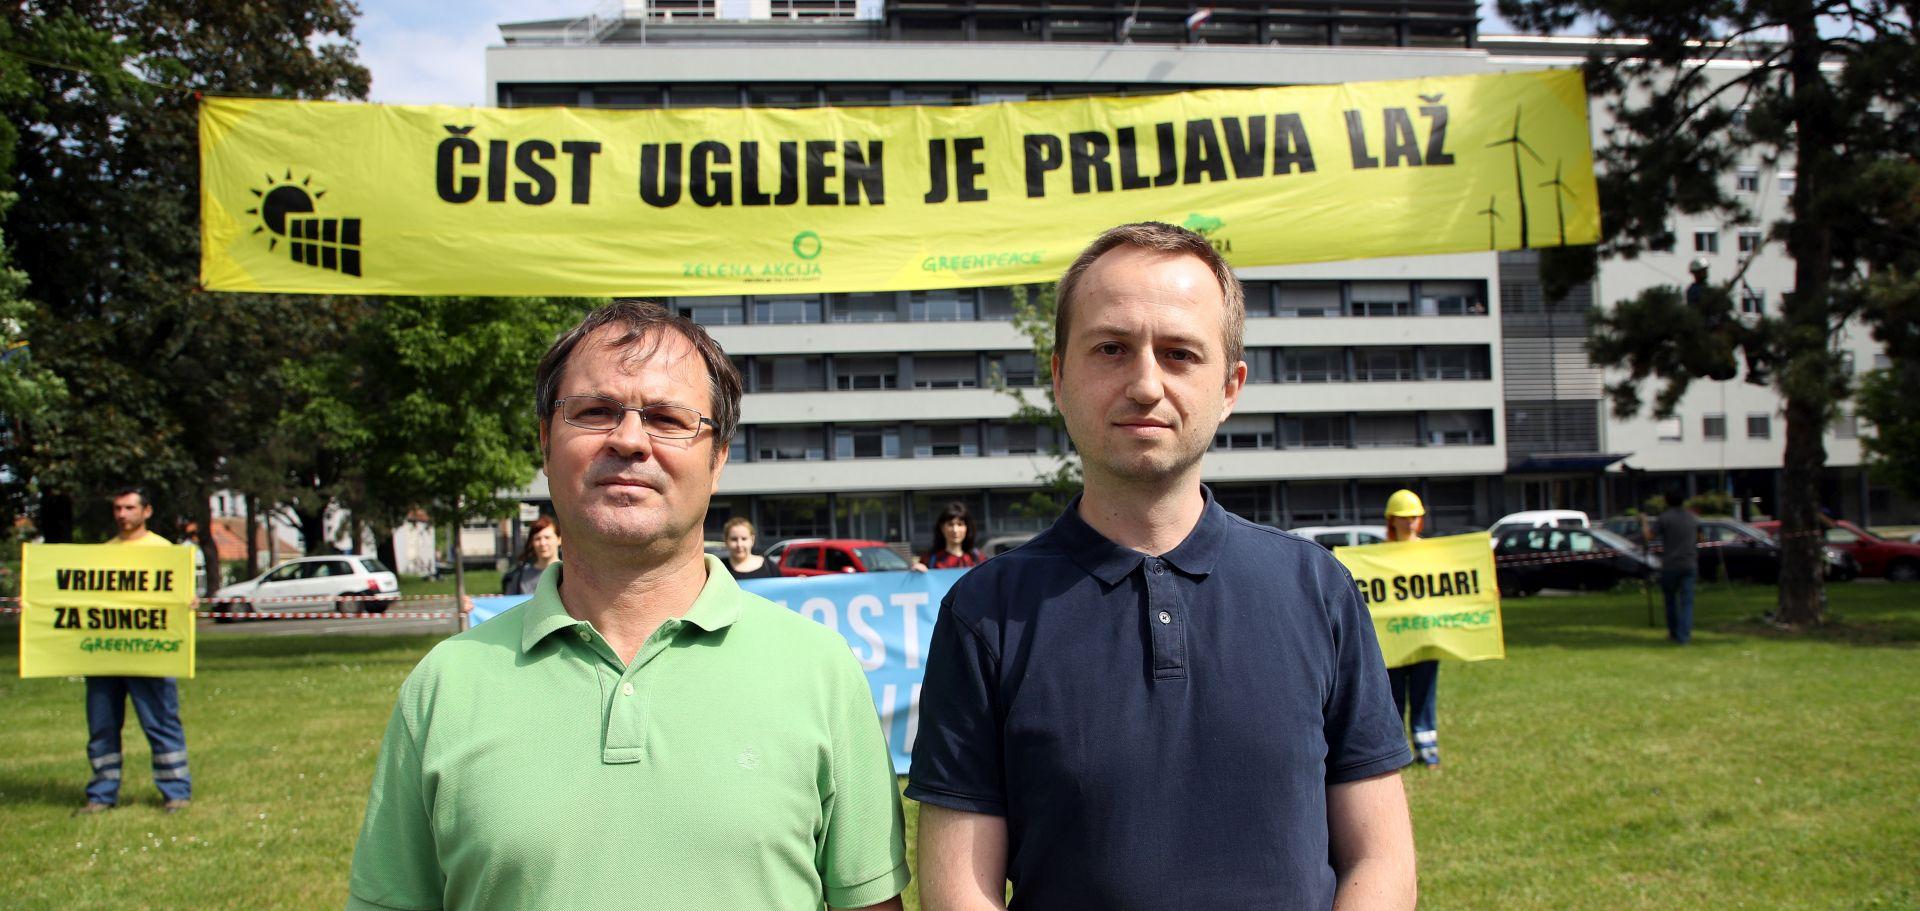 Prosvjed Greenpeacea i zelenih pred zgradom HEP-a